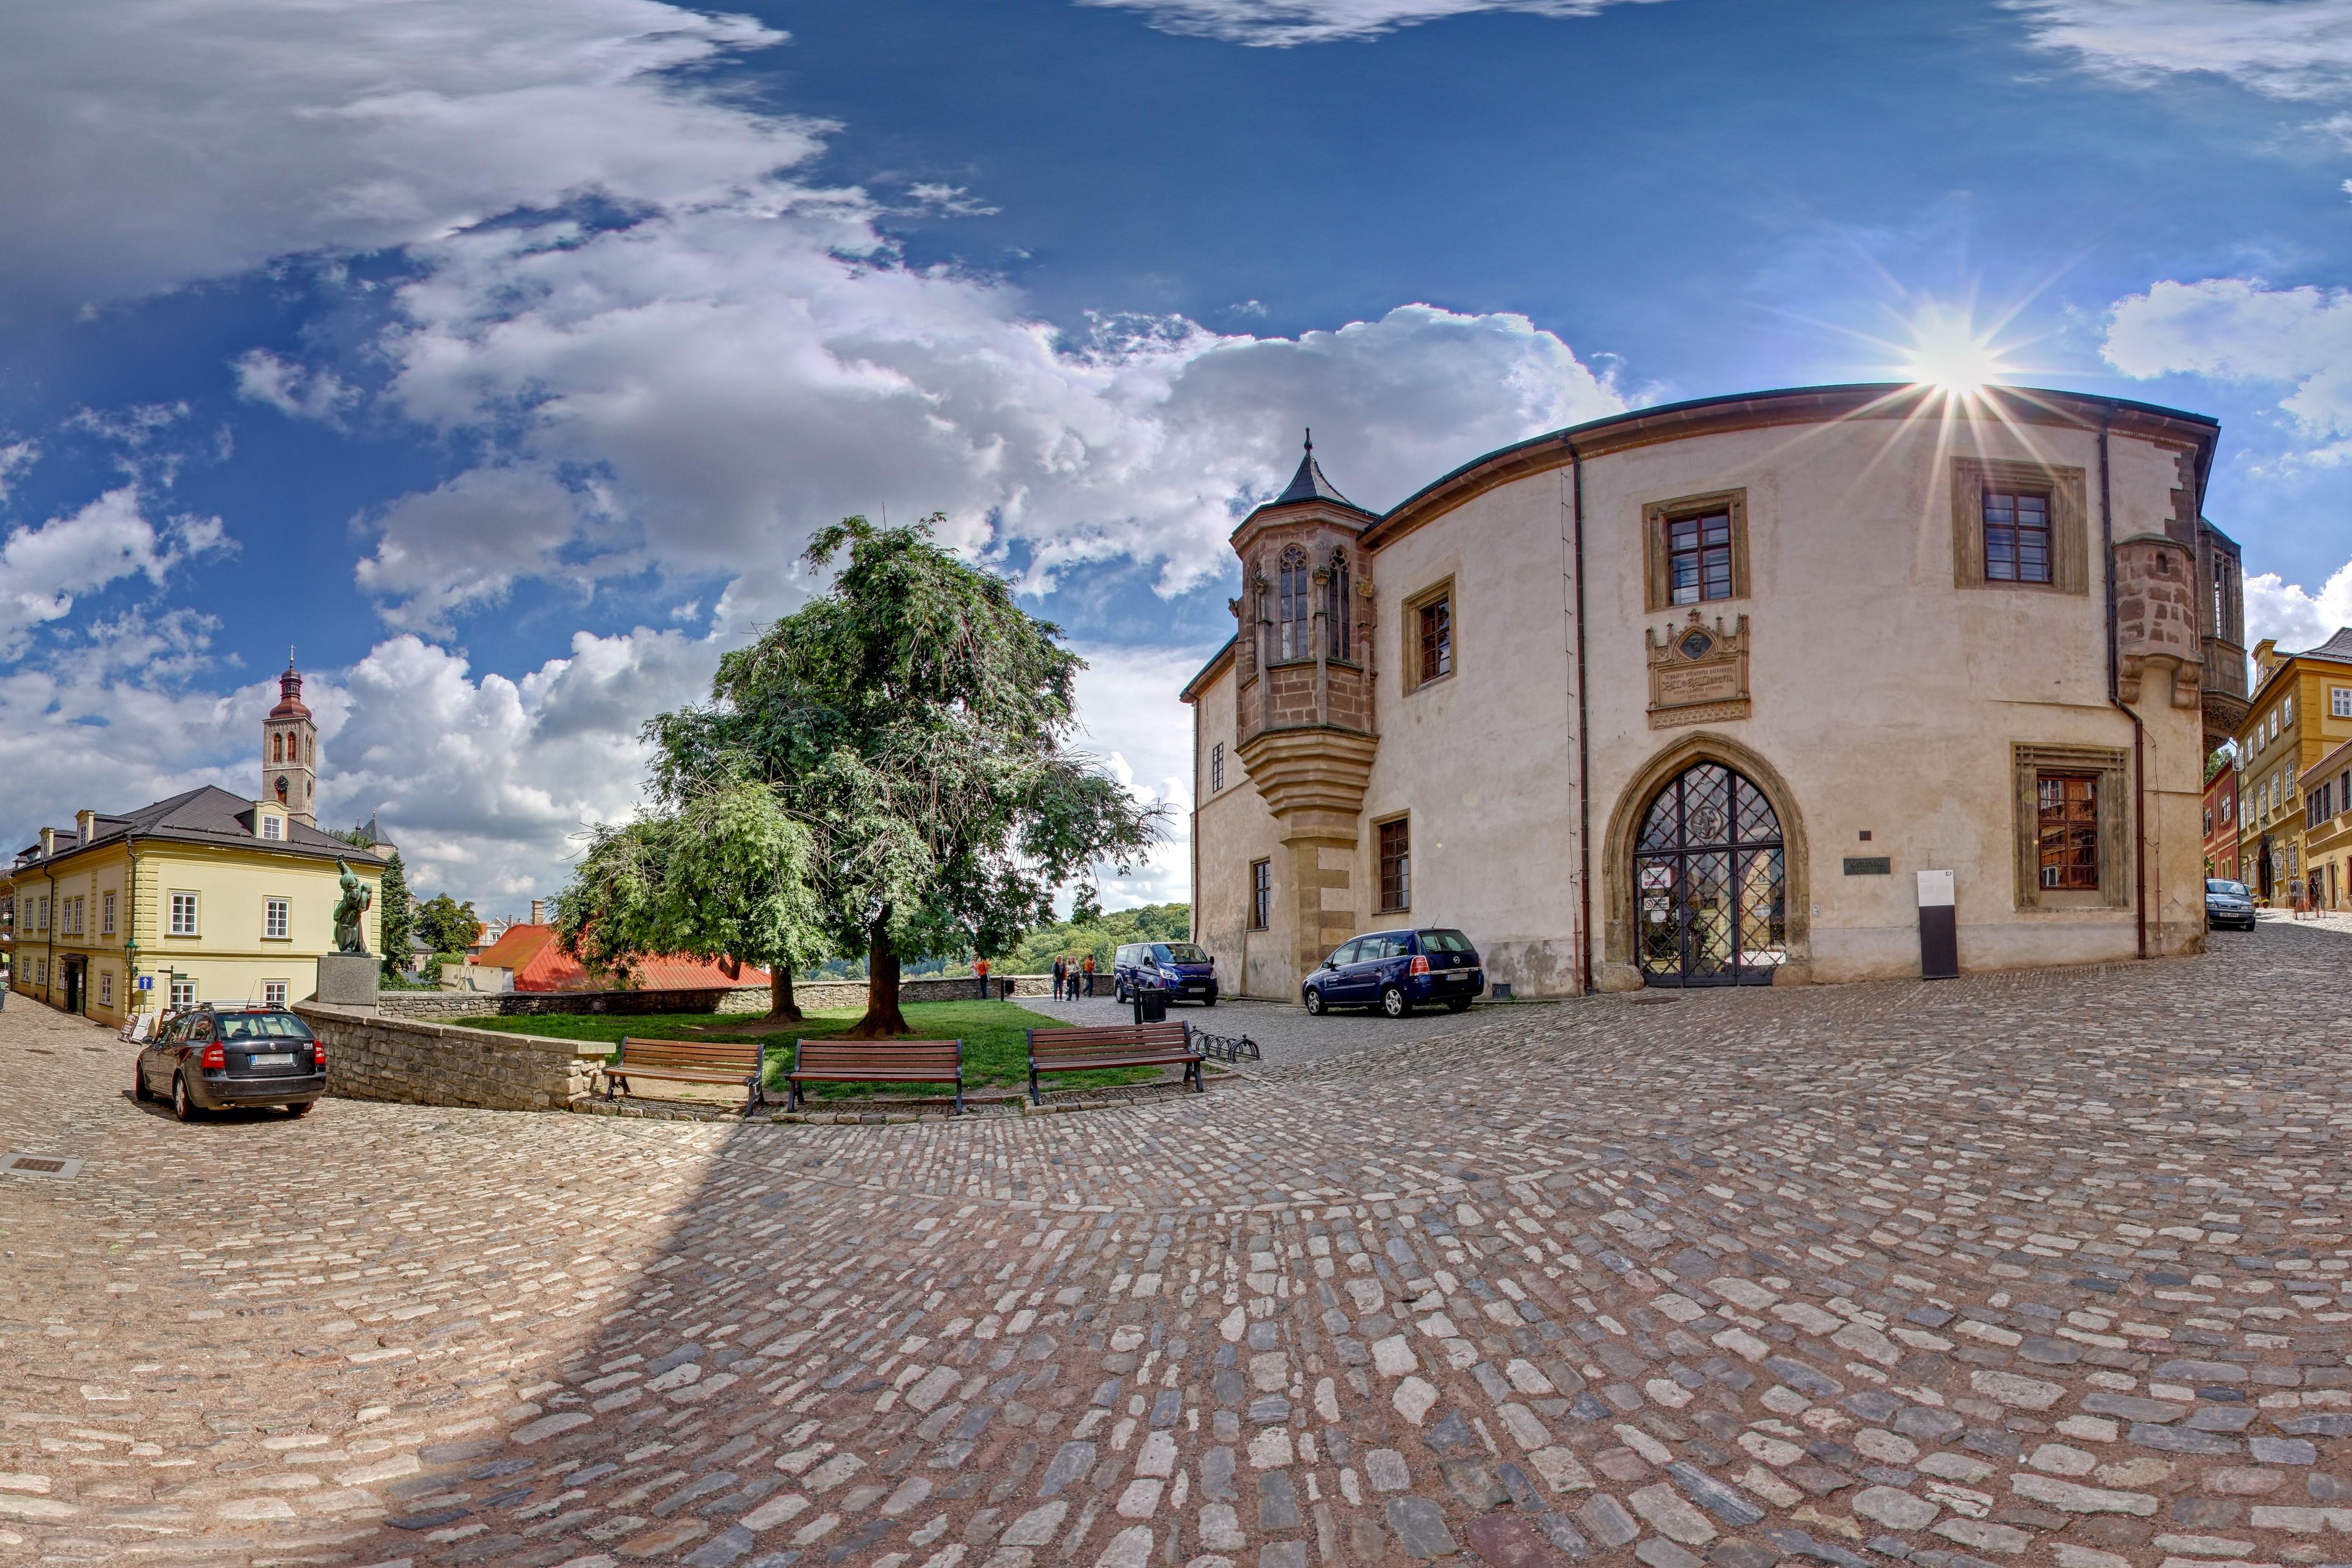 8409-ceske-muzeum-stribra-hradek-czech-muzeum-of-silver-hradek.jpg